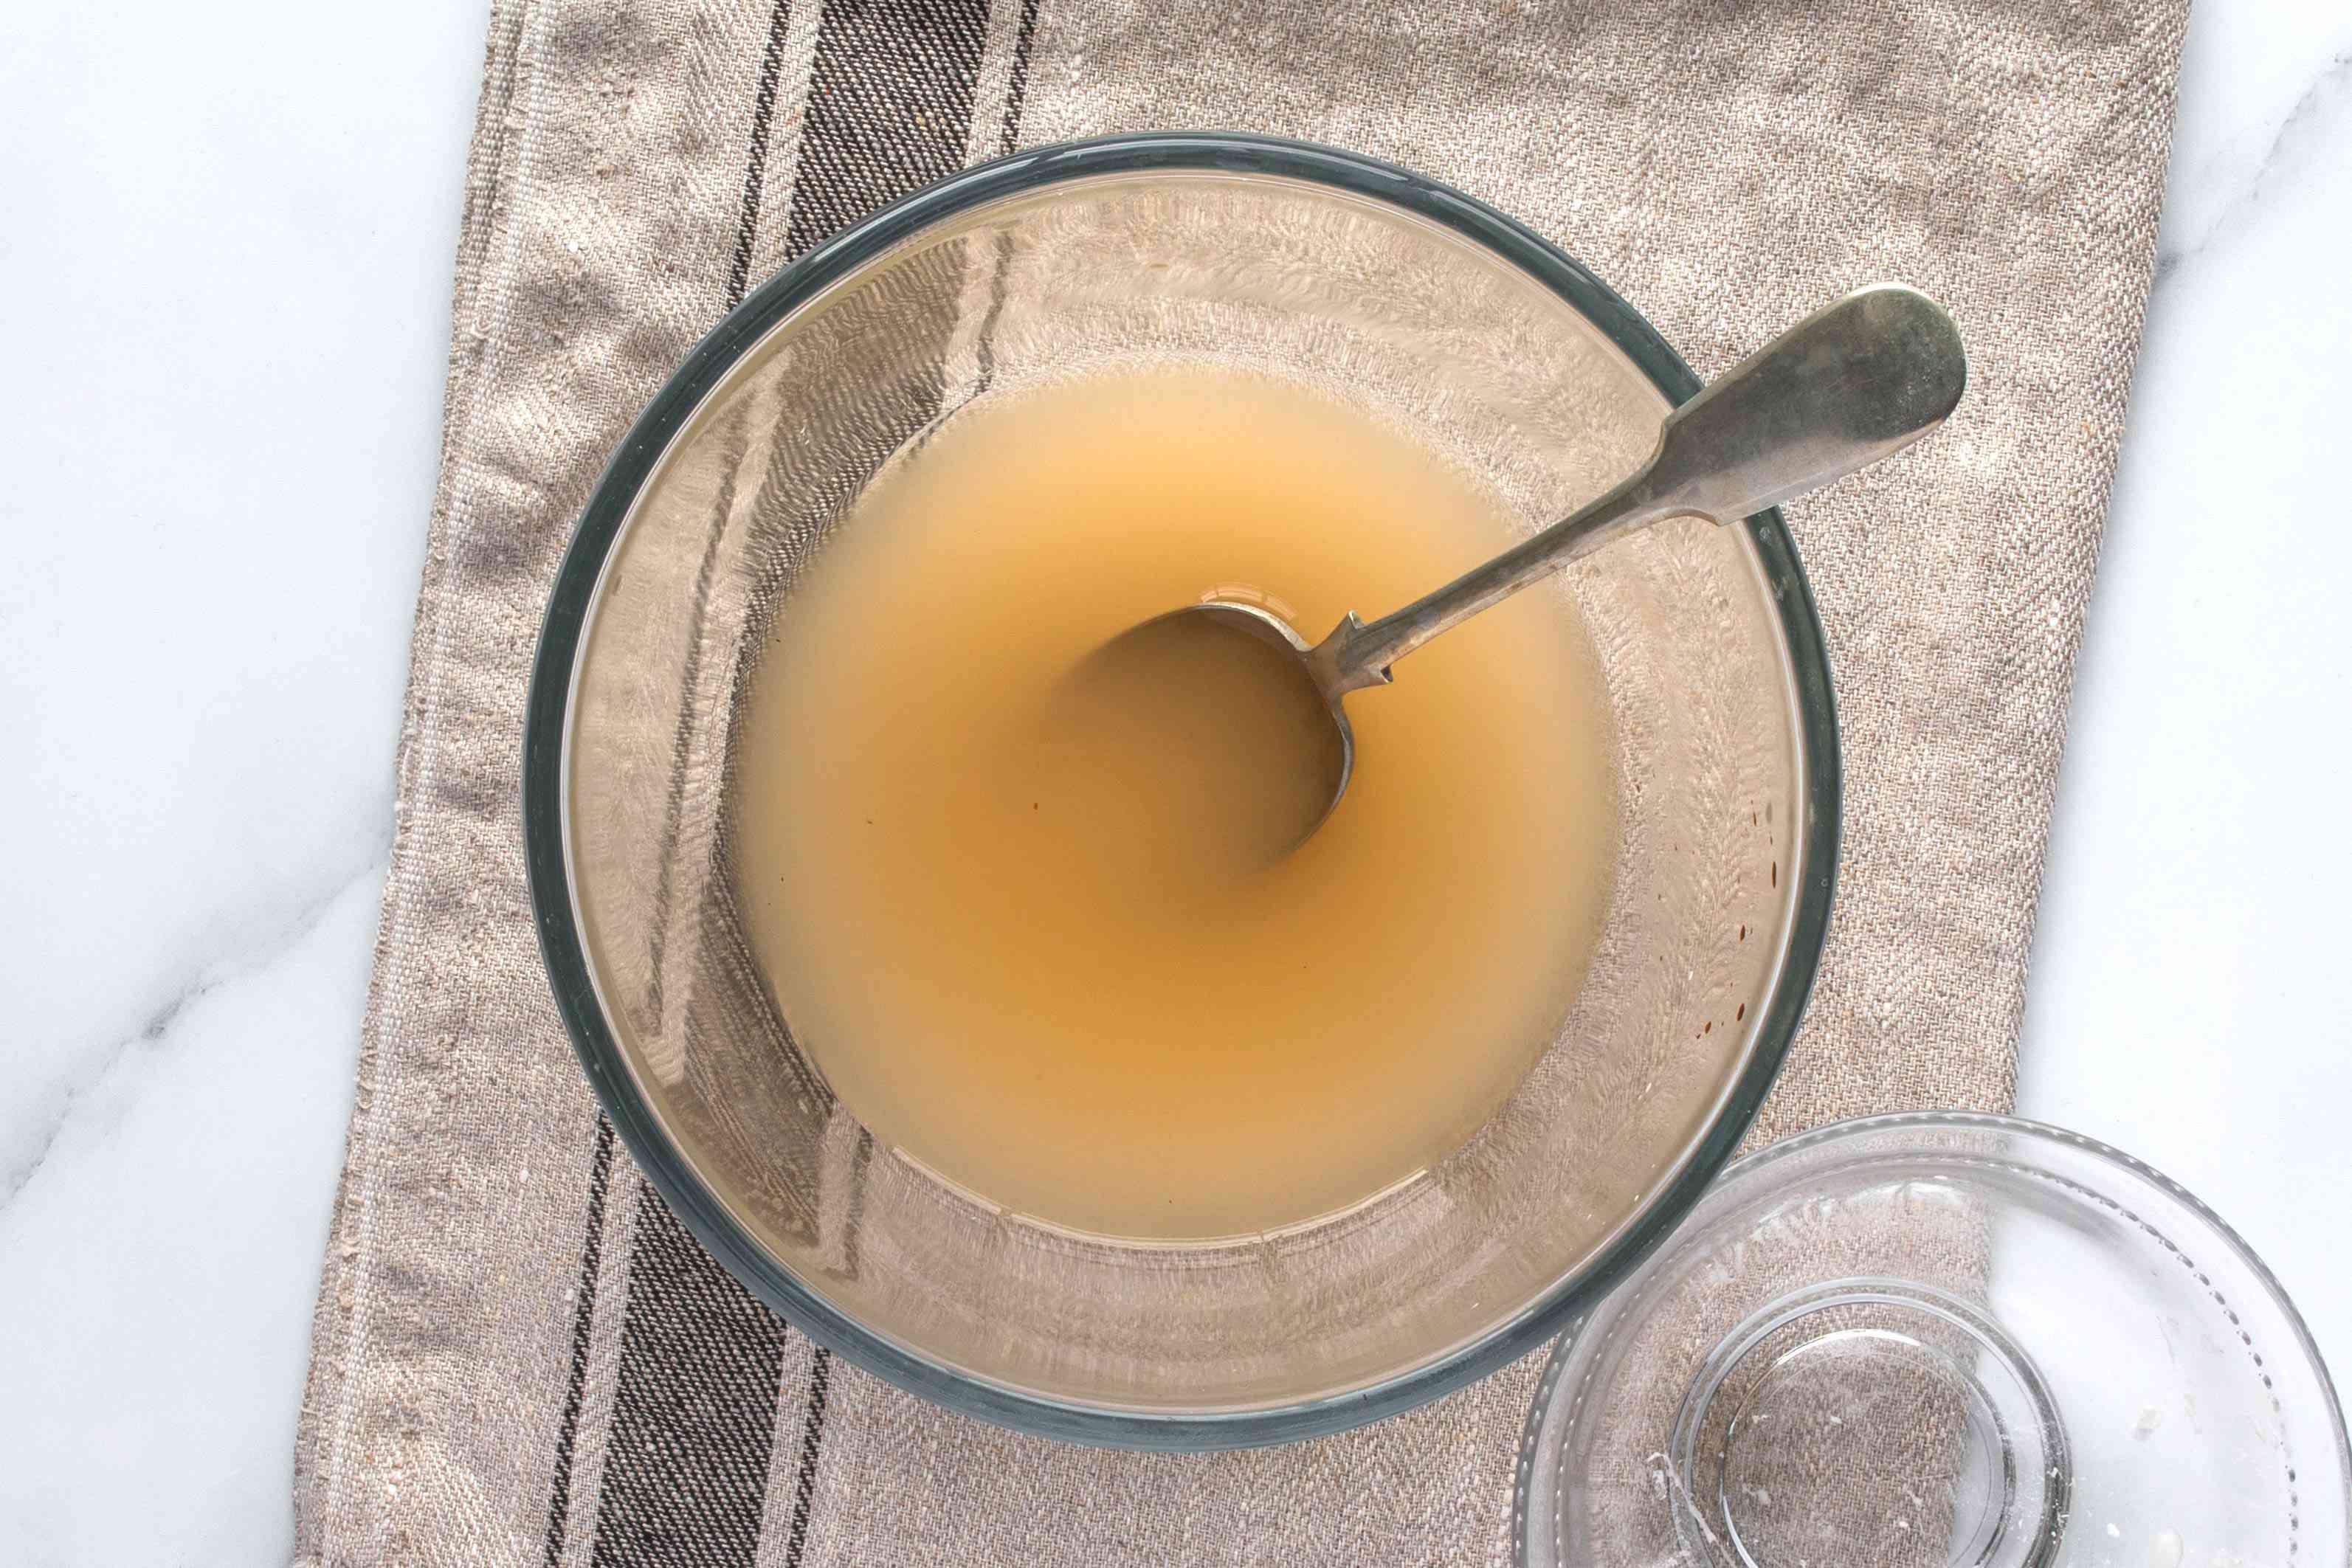 Potato starch mixed into shiitake soaking liquid in a bowl